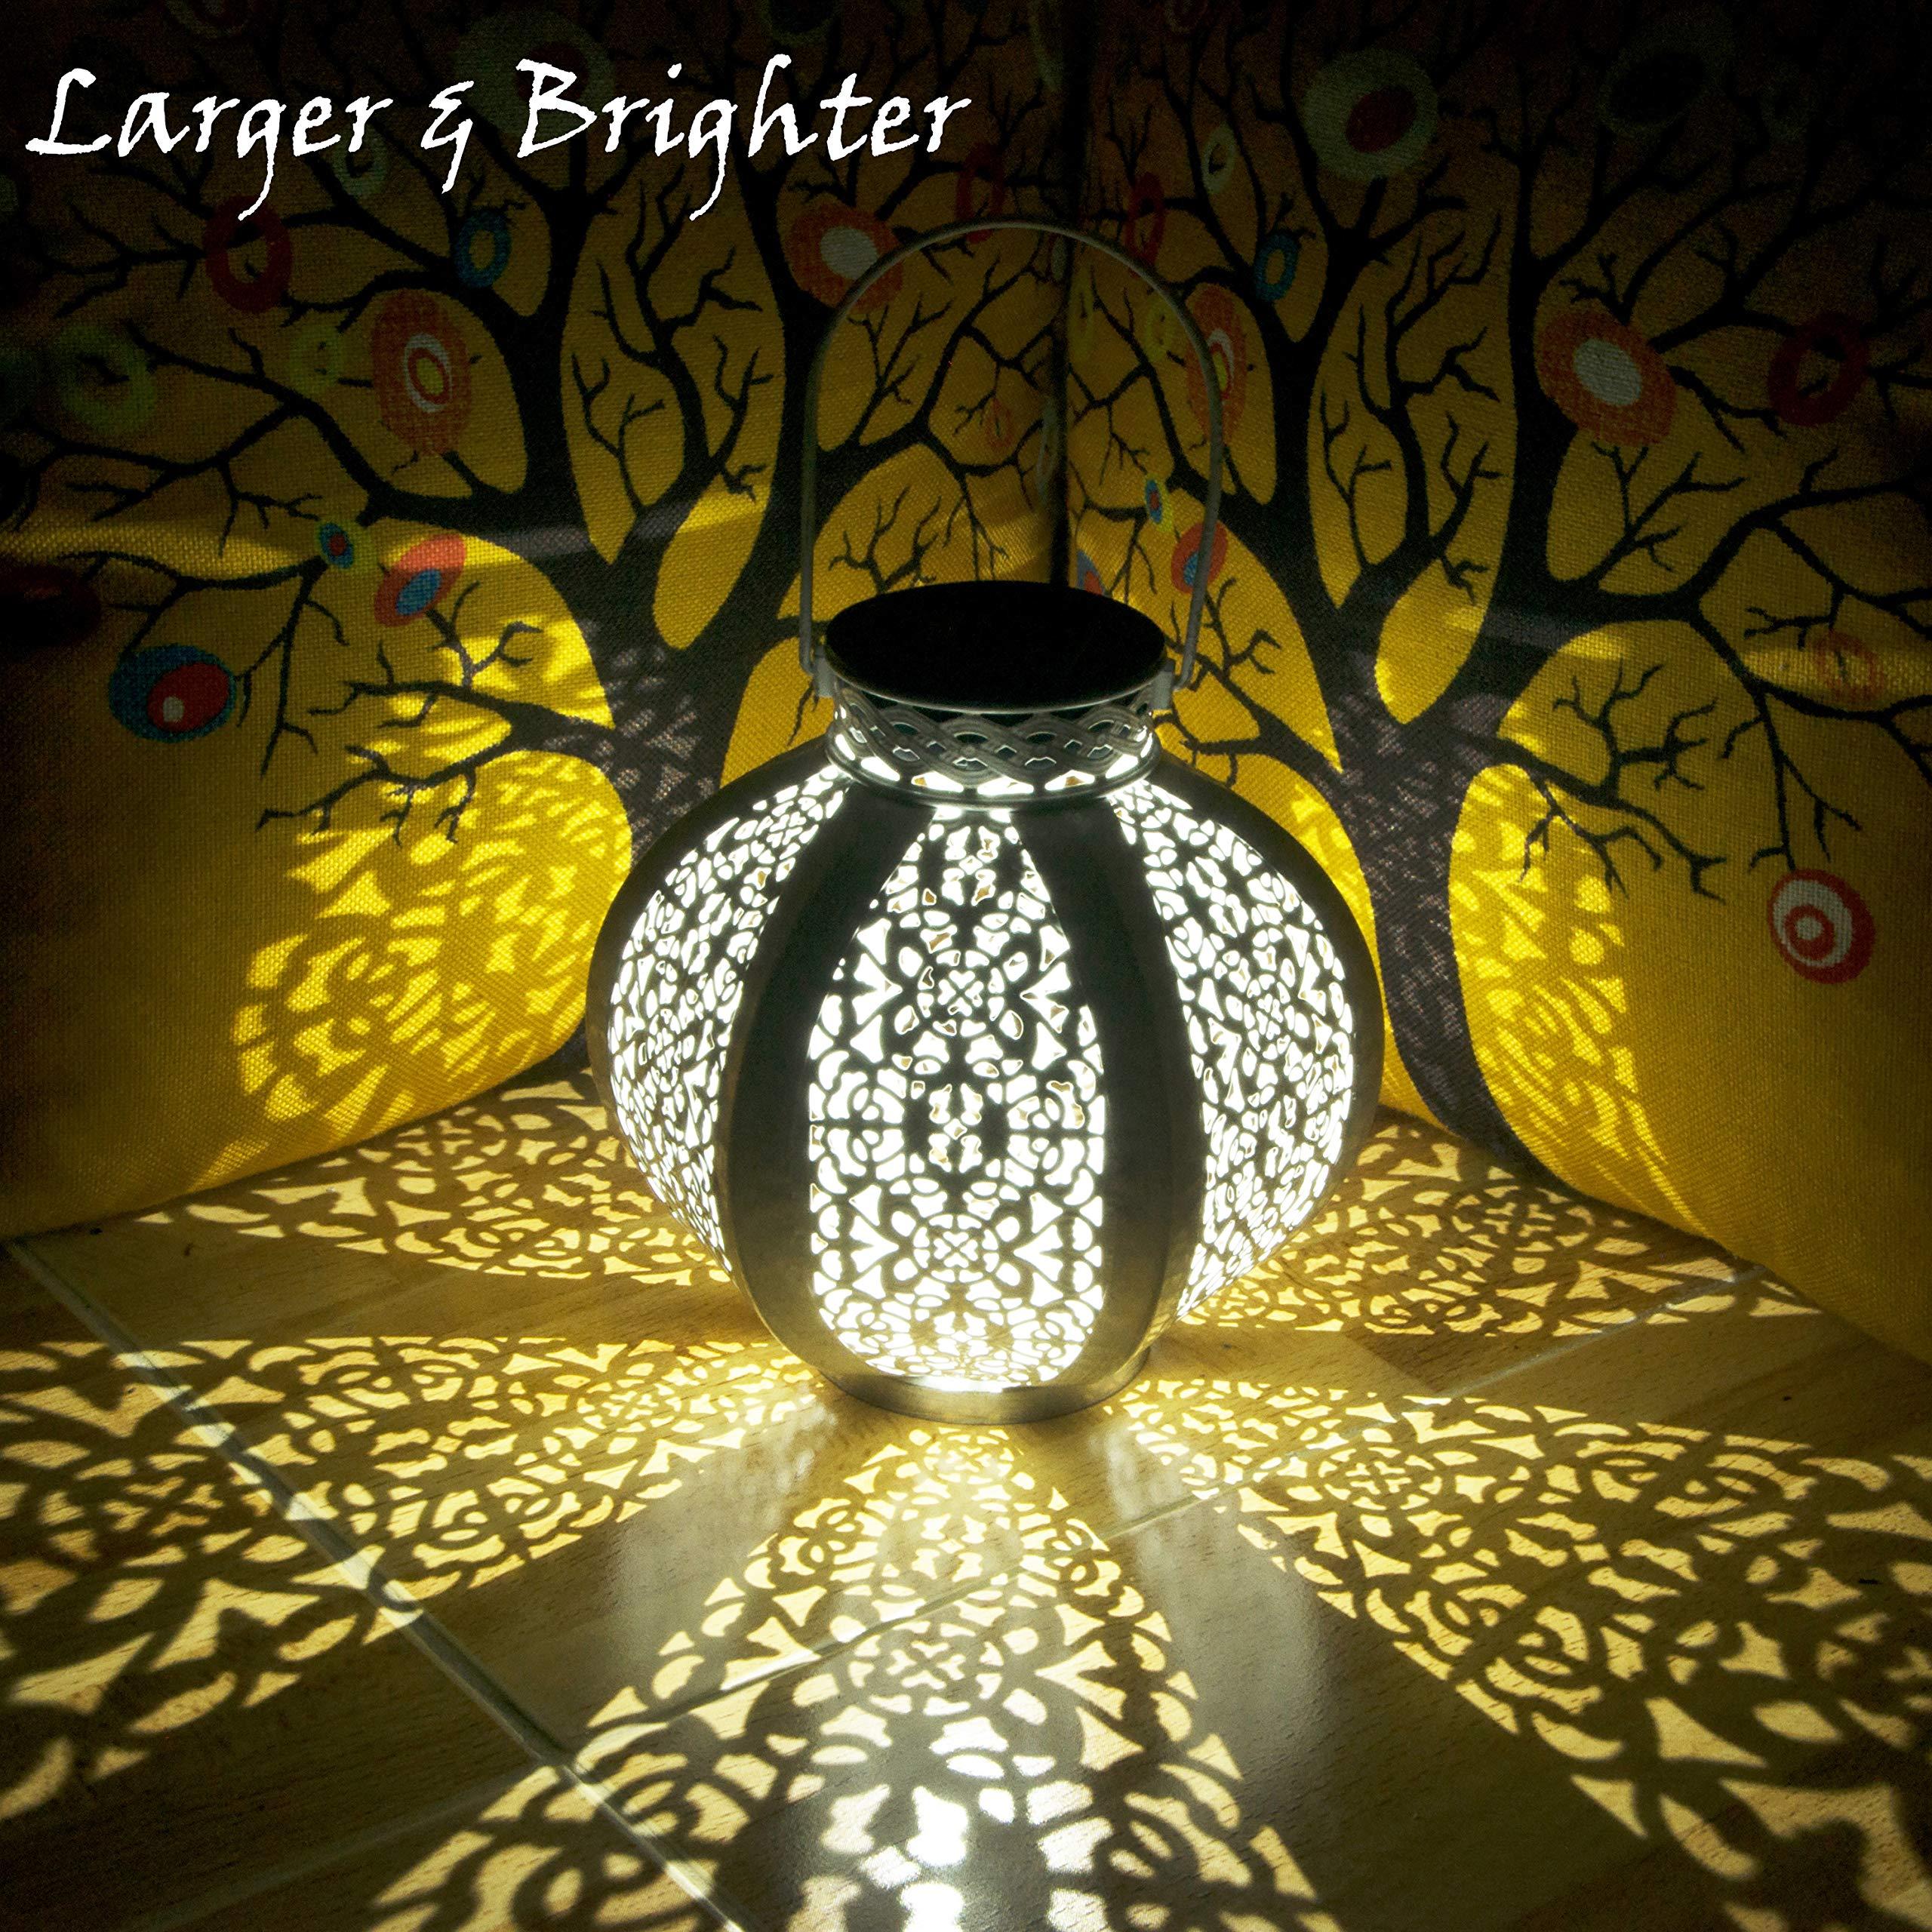 ArDeLi 26 Lumens Solar Lanterns Outdoor Hanging, Ancient Waterproof Solar Lantern Lights with Hanging for Outdoor Decorative Lights, Decoration Equipment, White